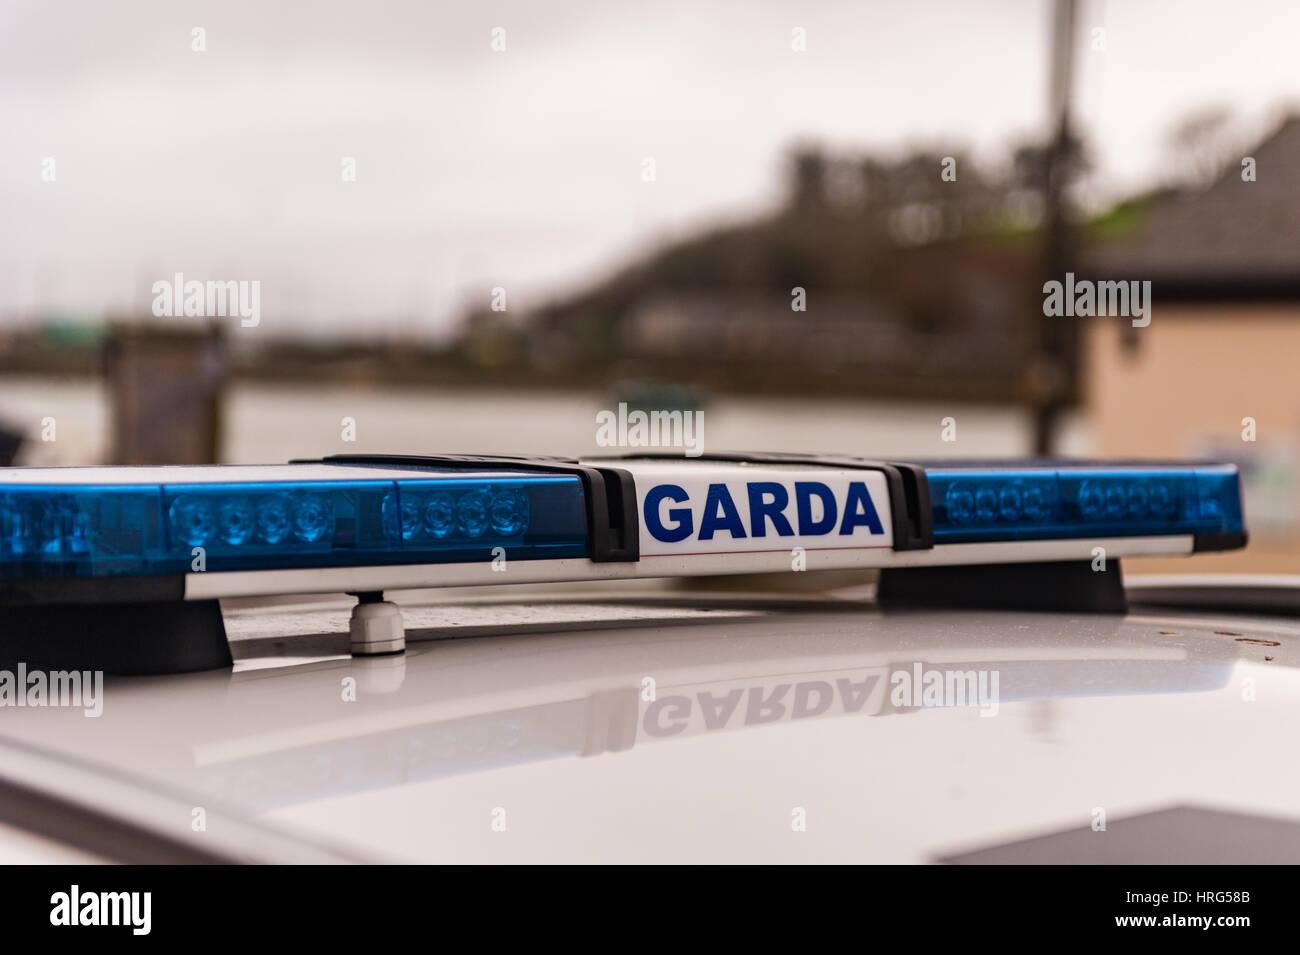 Garda/Irish Police sign and blue lights on a Garda/Police car with copy space. Stock Photo